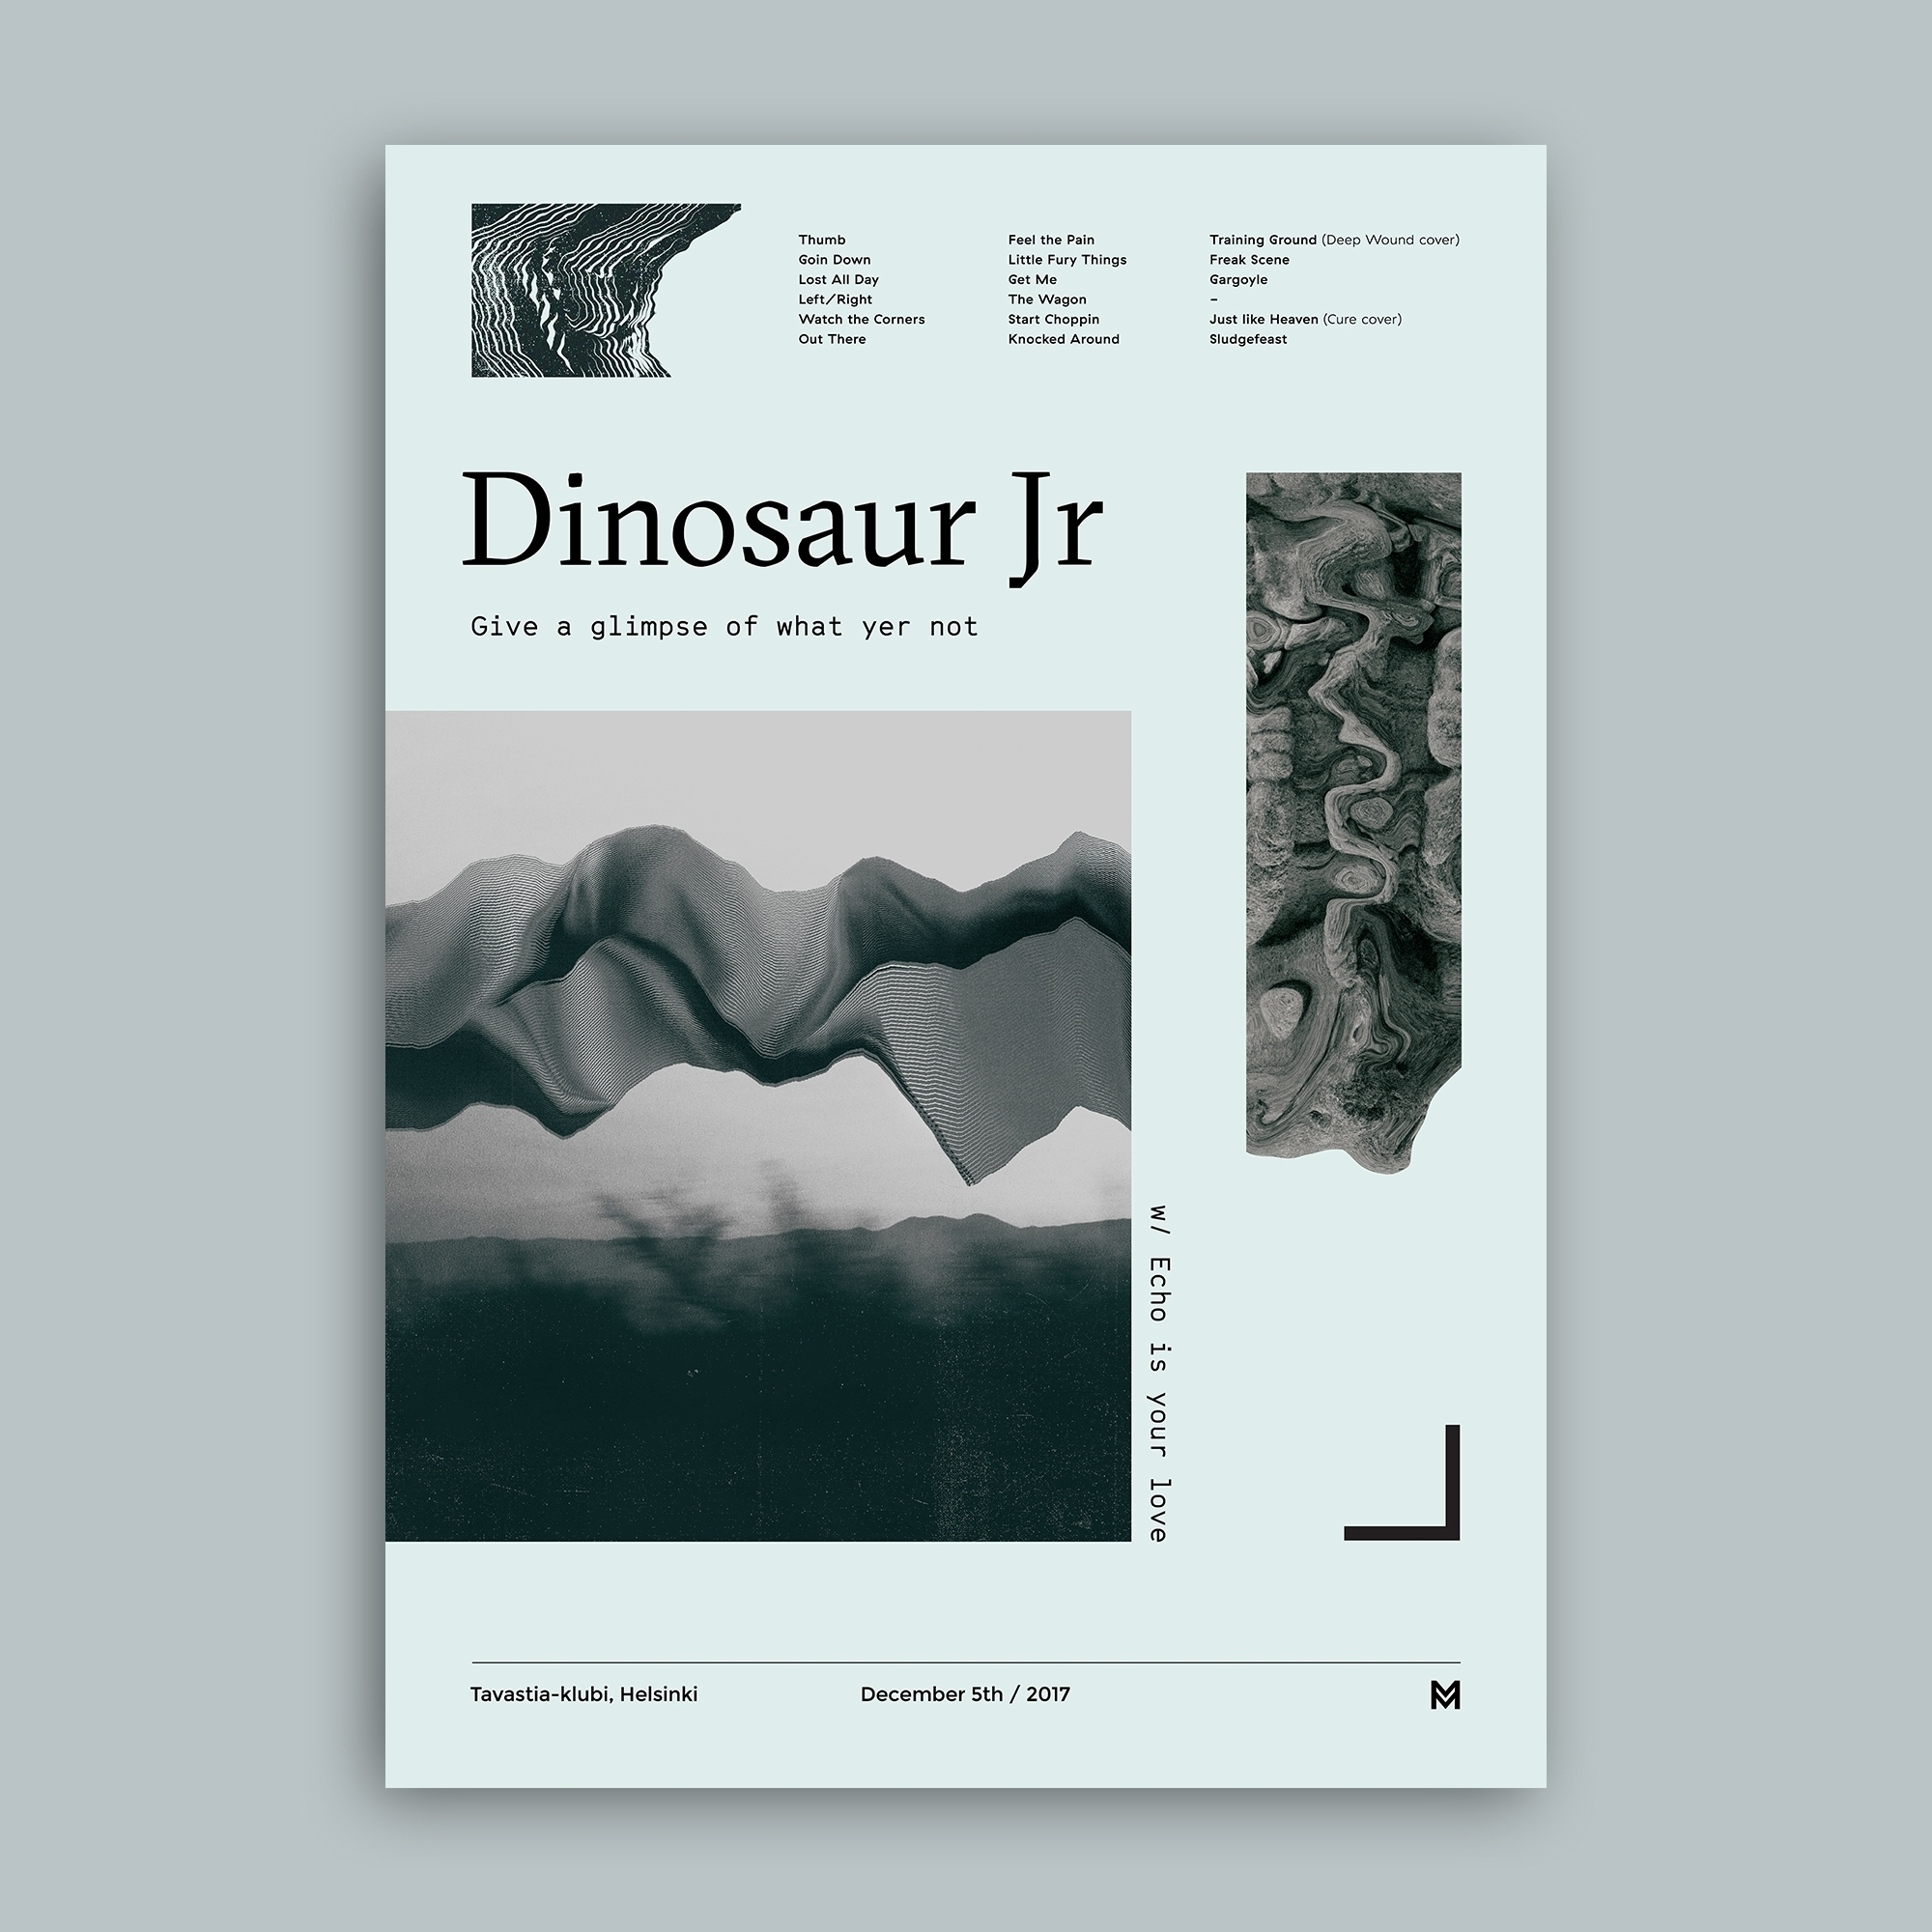 Gig poster project - Dinosaur J - mcinen | ello